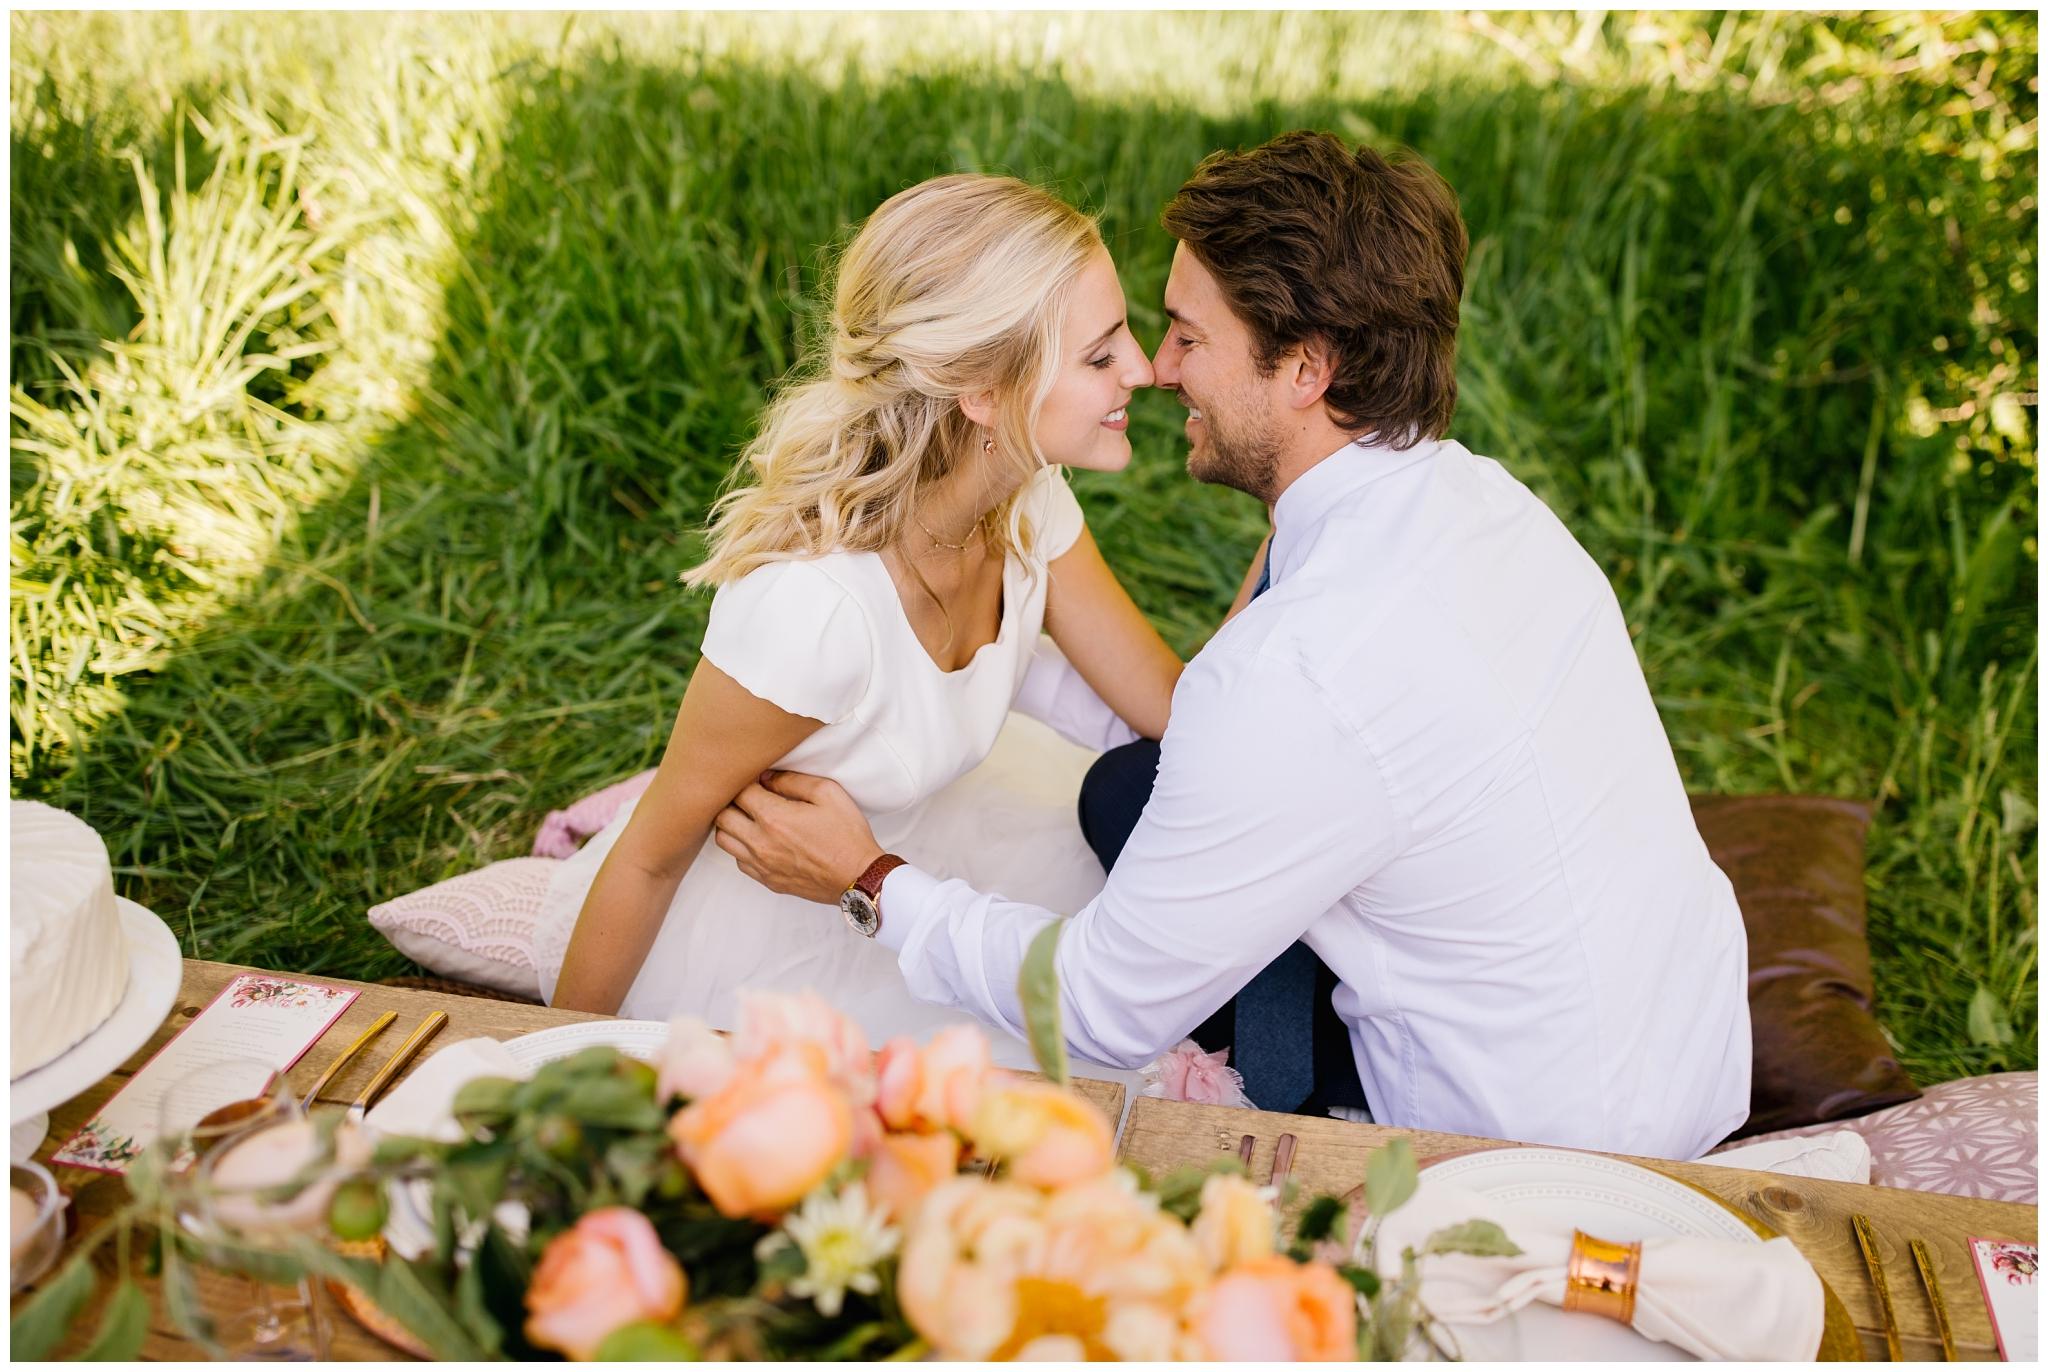 Lizzie-B-Imagery-Utah-Wedding-Photographer-Park-City-Photographer_0029.jpg